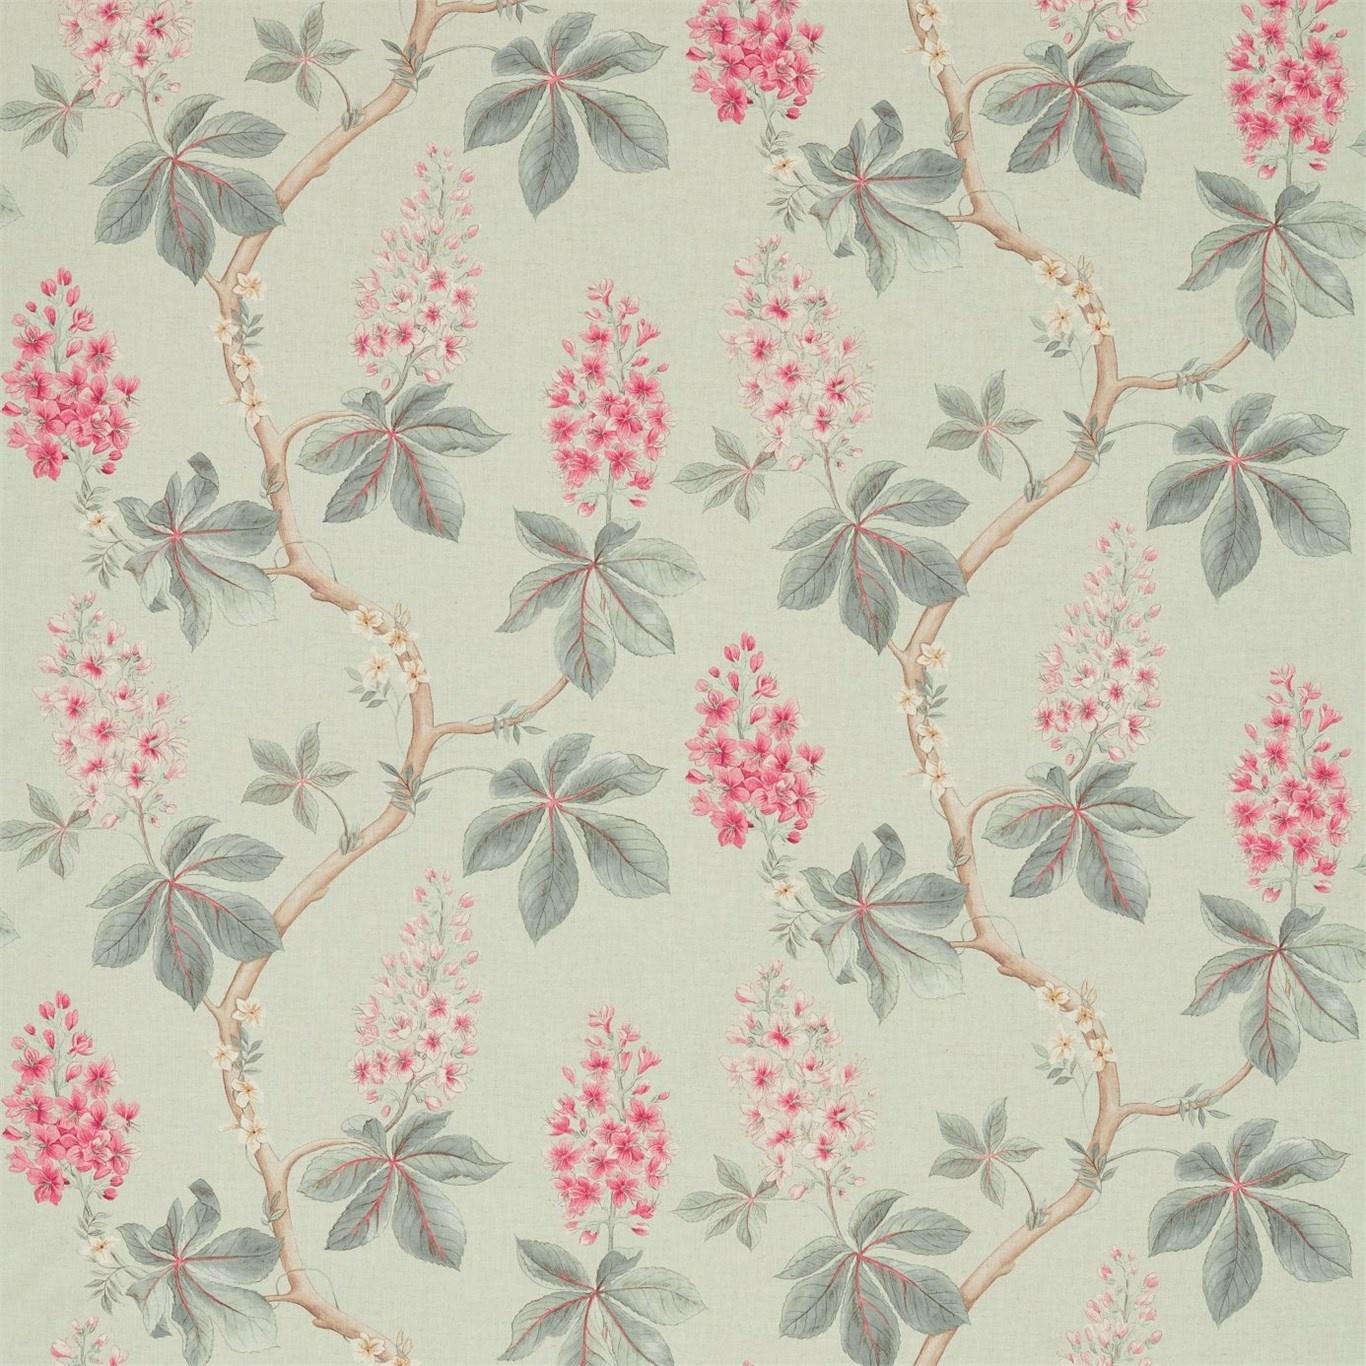 Image of Sanderson Chestnut Tree Seaspray/Peony Fabric 225515